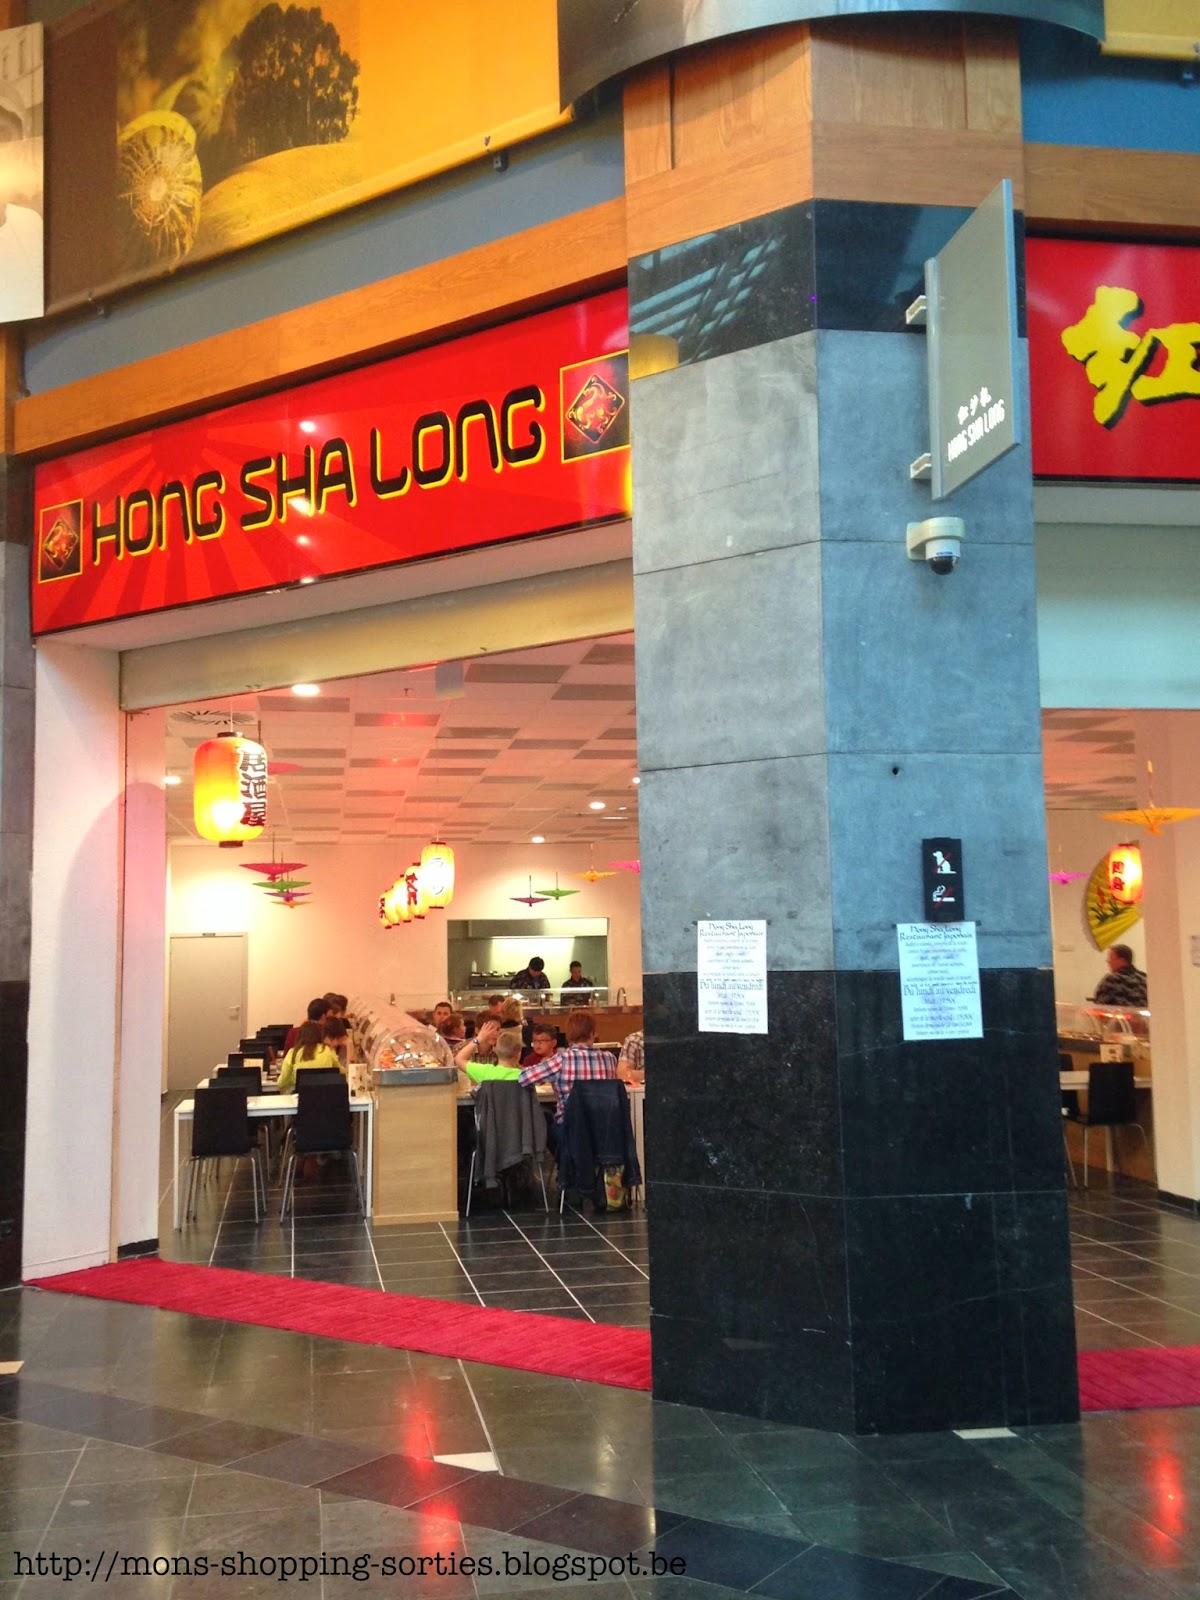 Restaurant Asiatique Pres Burger King Porte De Clichy